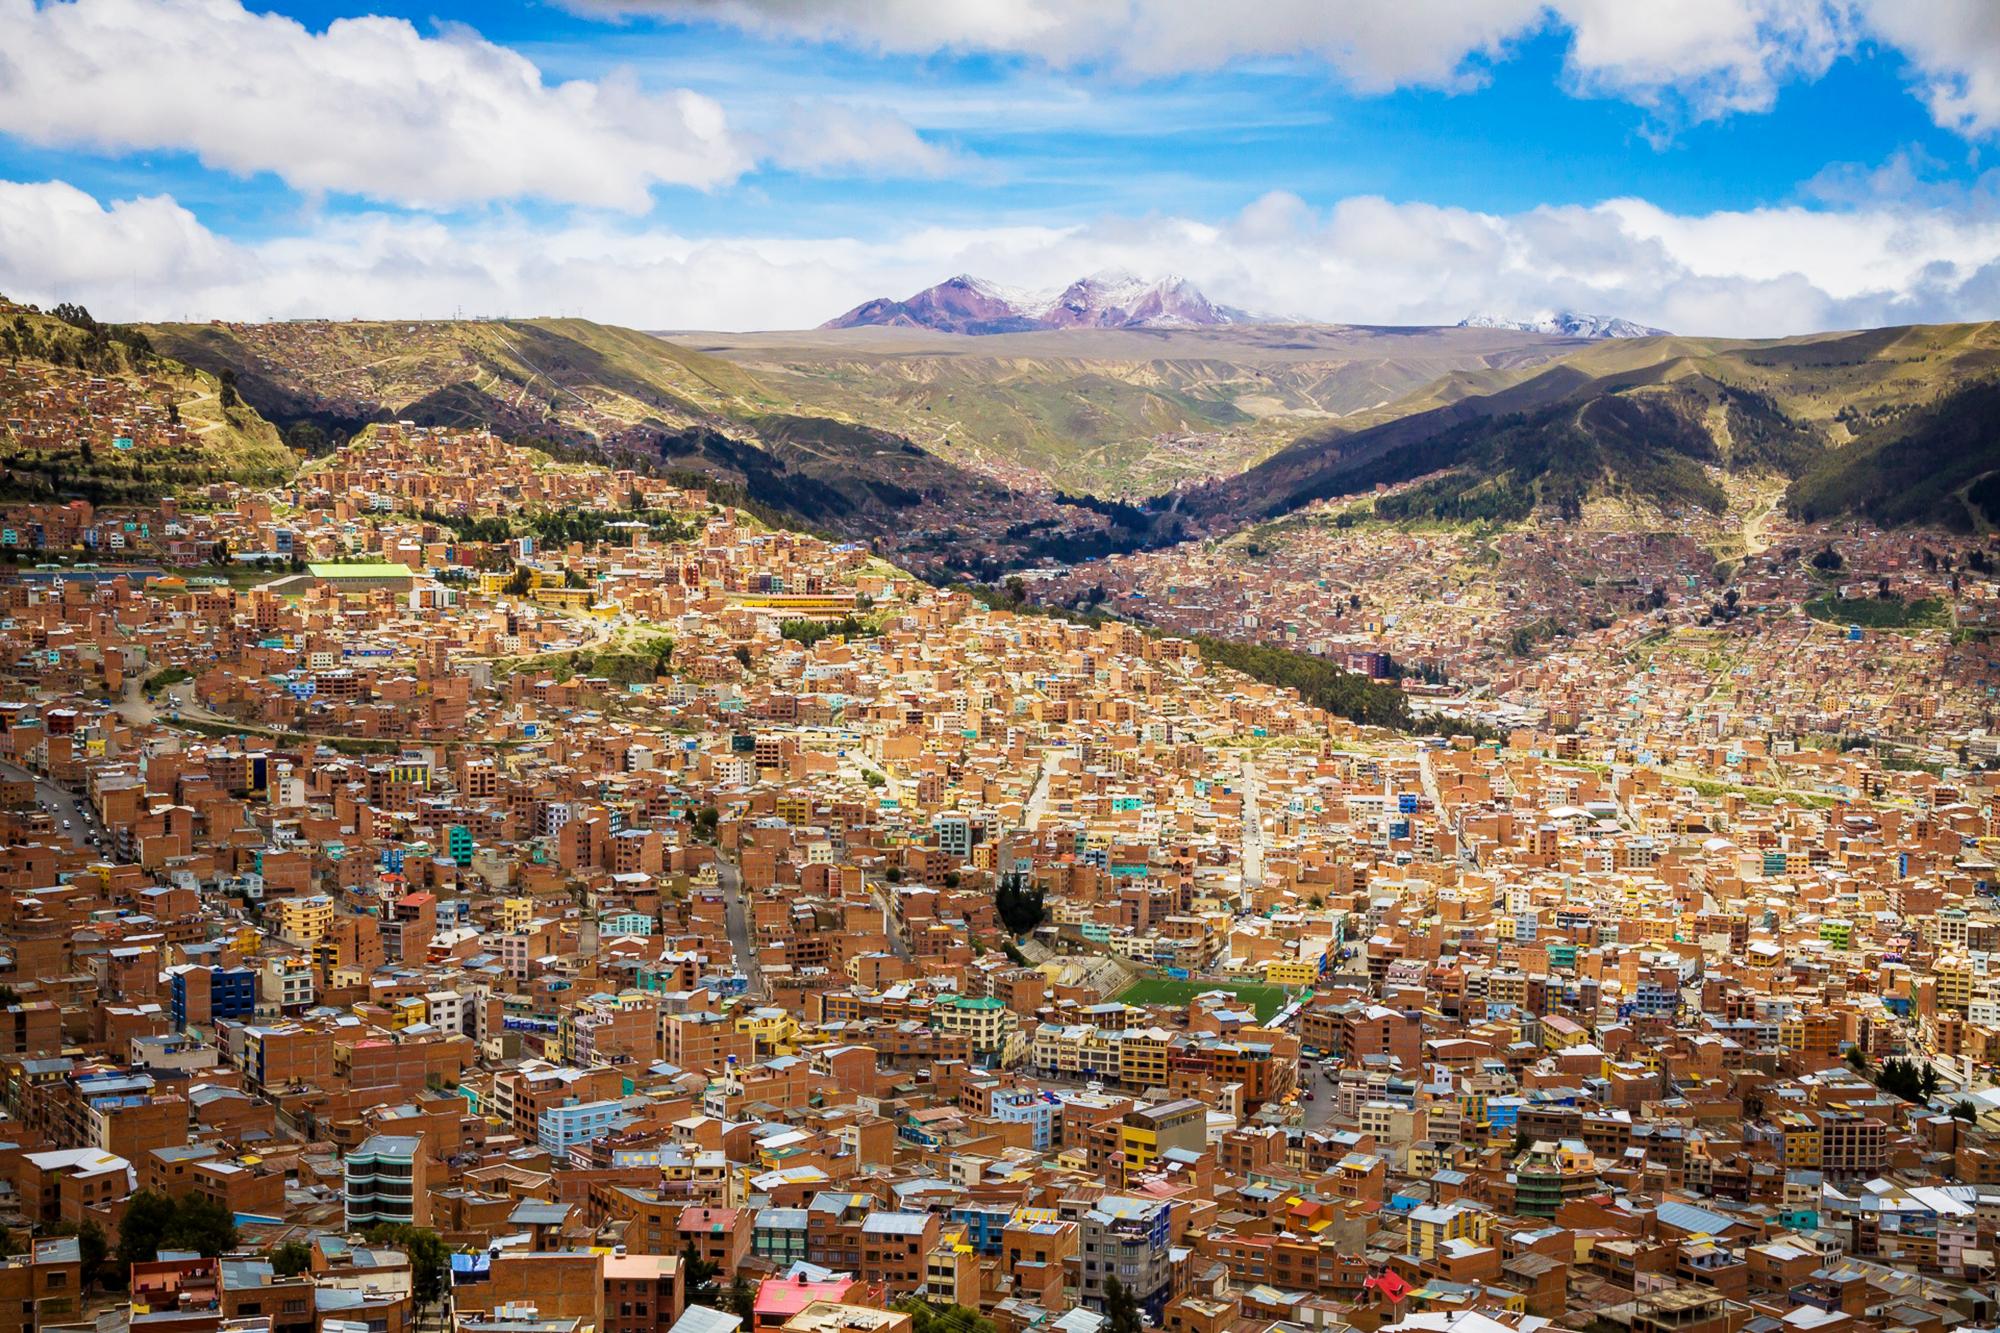 Destination 2 – La Paz